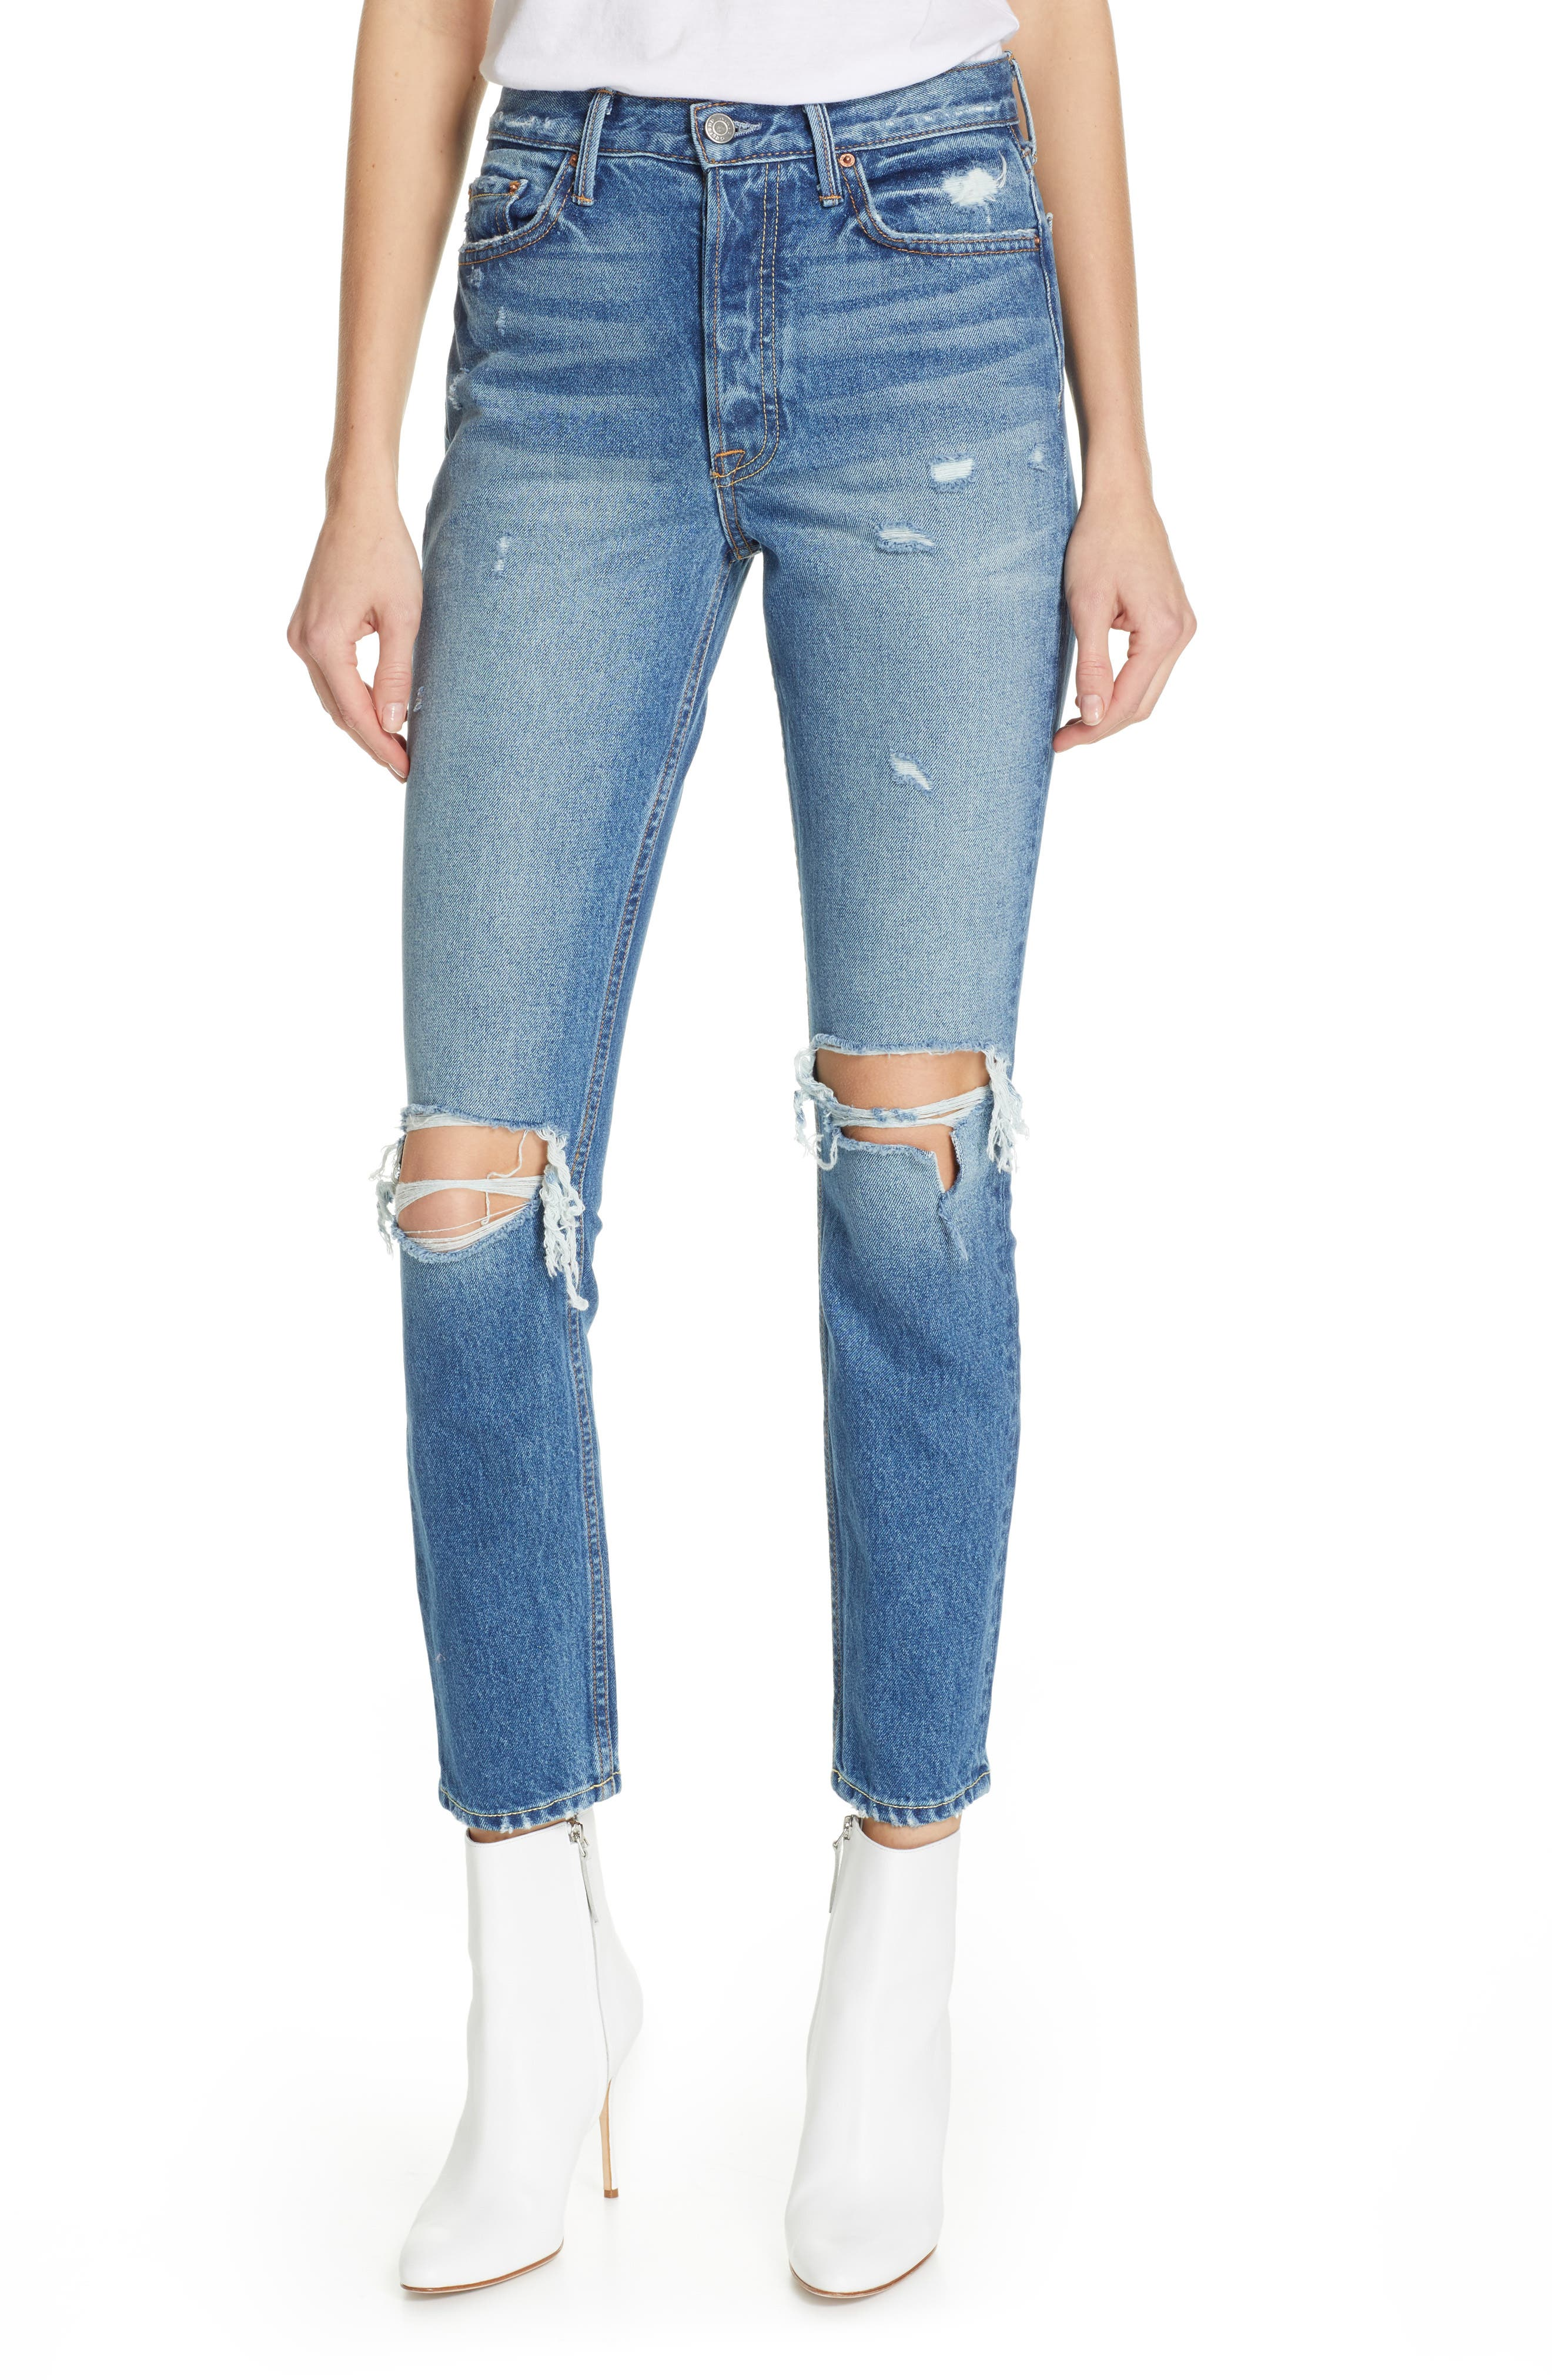 GRLFRND Karolina Ripped High Waist Skinny Jeans, Main, color, I PUT A SPELL ON YOU